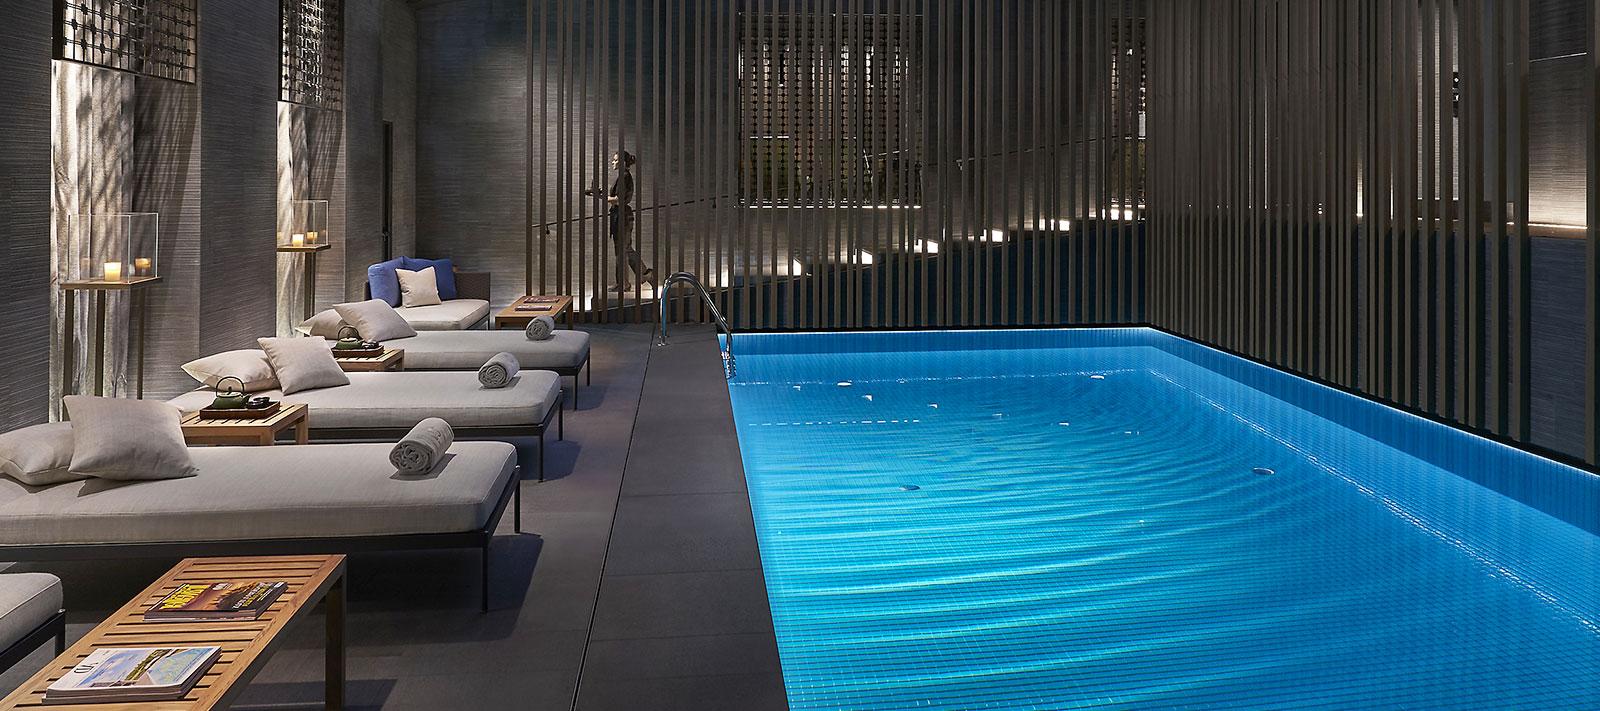 piscine_strutture ricettive hotel culligan